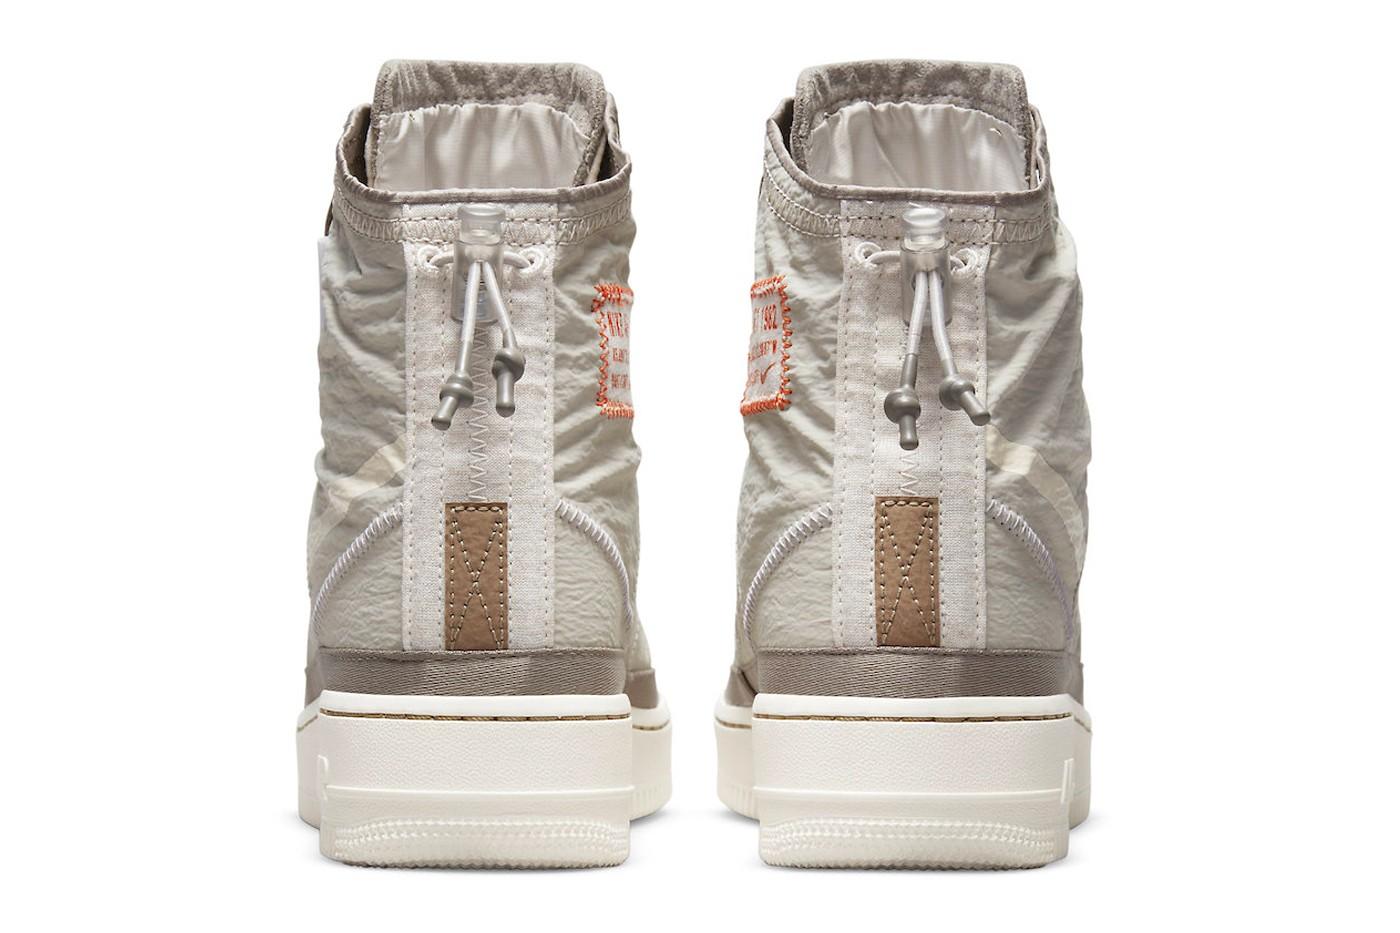 Nike Air Force 1 Shell